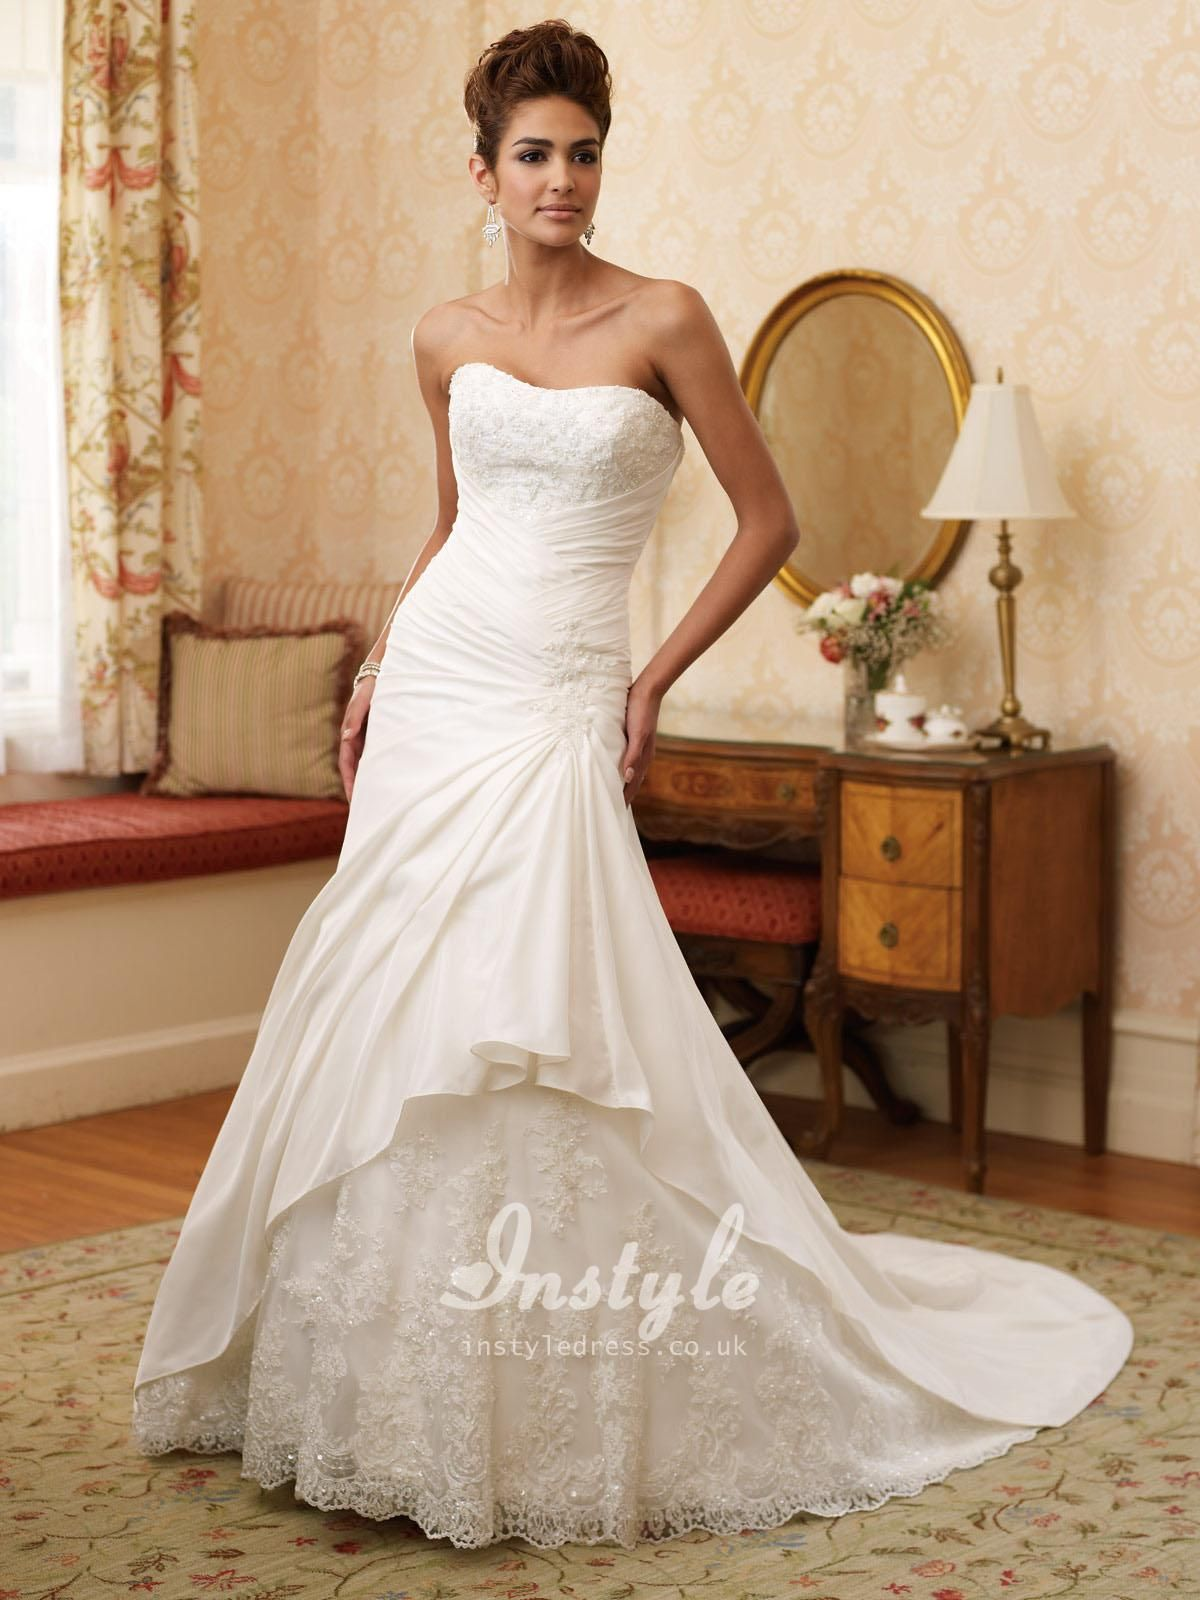 Wedding dress short in front with long train  strapless taffeta aline wedding dress  Wedding ideas  Pinterest